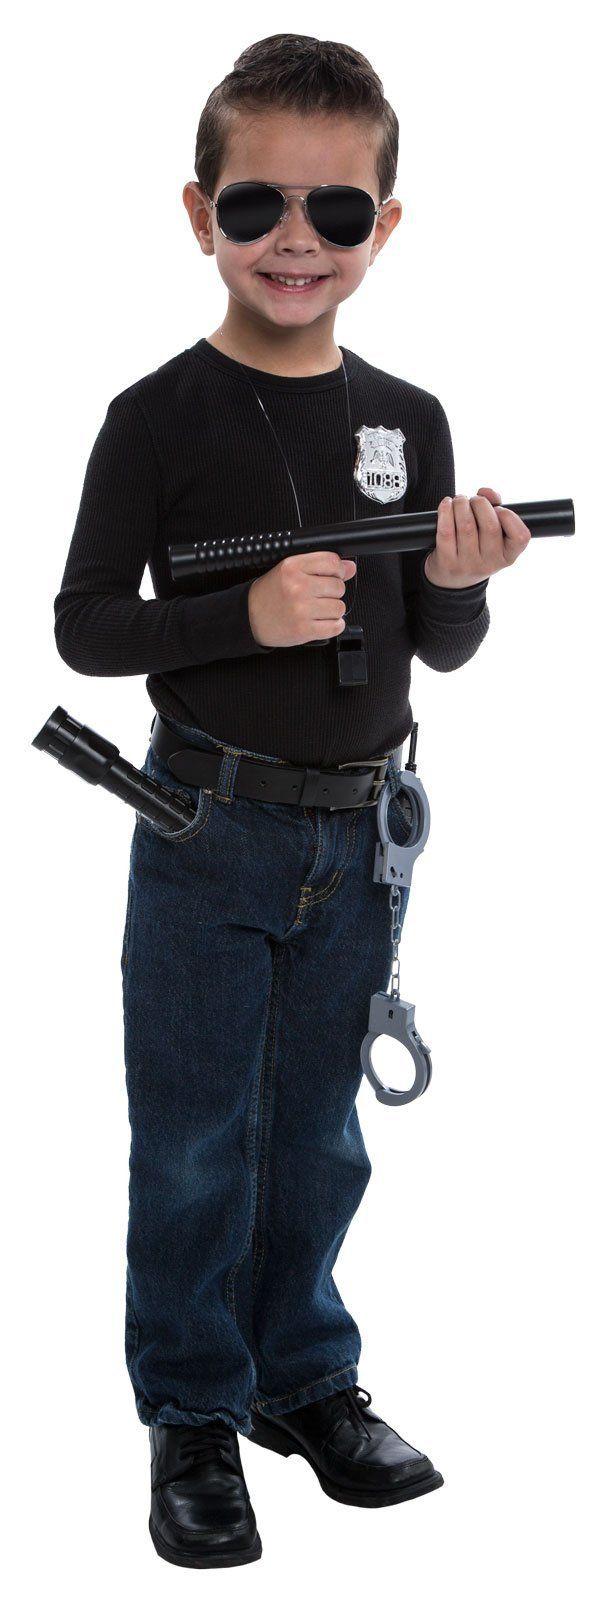 Police Dress Up Accessory Kit